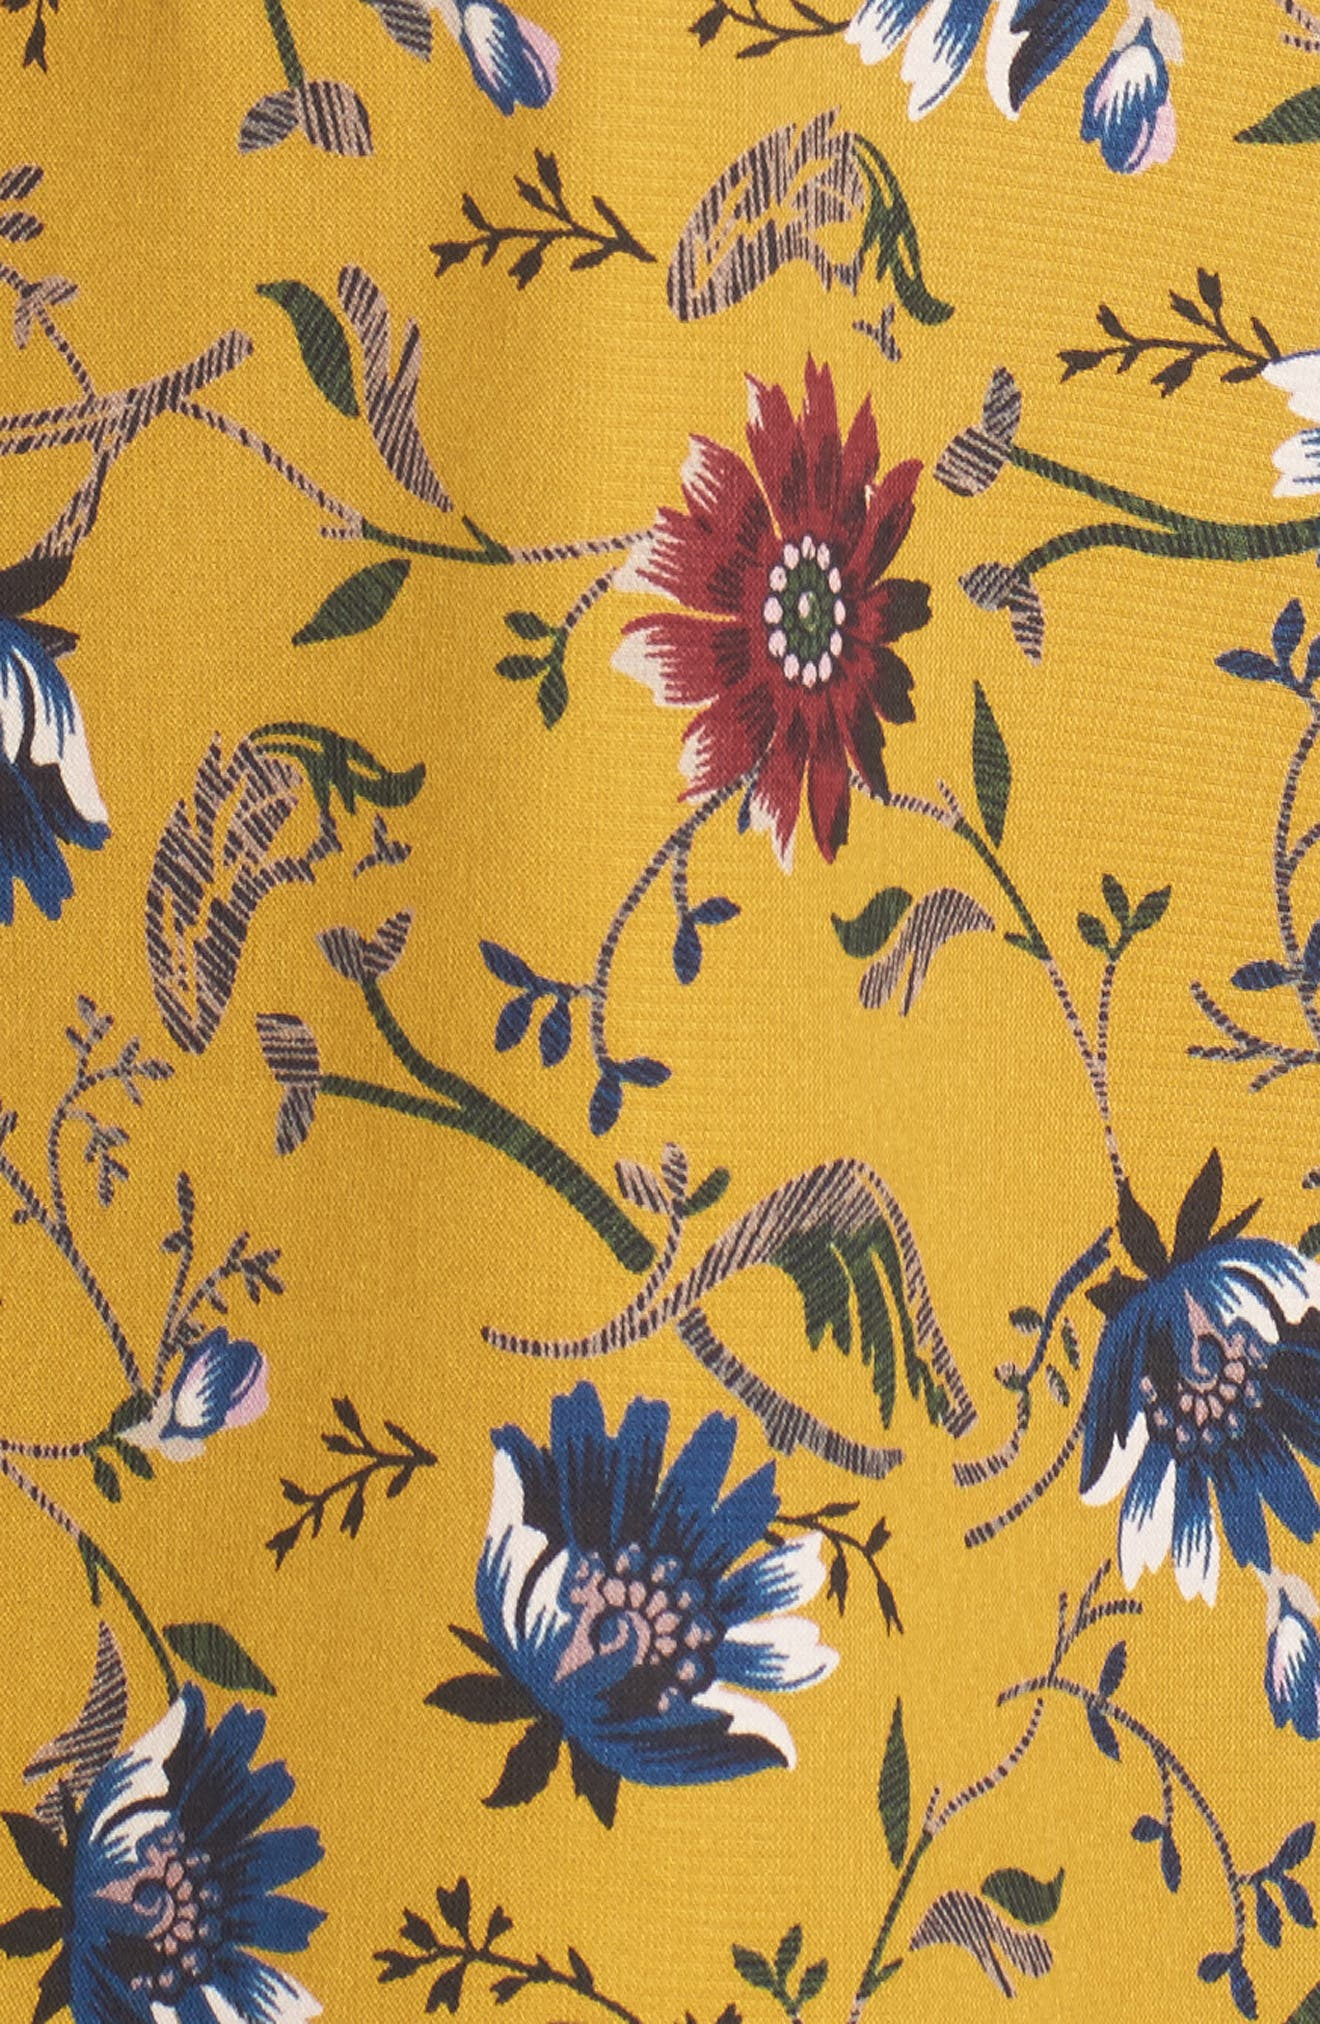 Danee Floral Top,                             Alternate thumbnail 5, color,                             Marigold/ Ivory